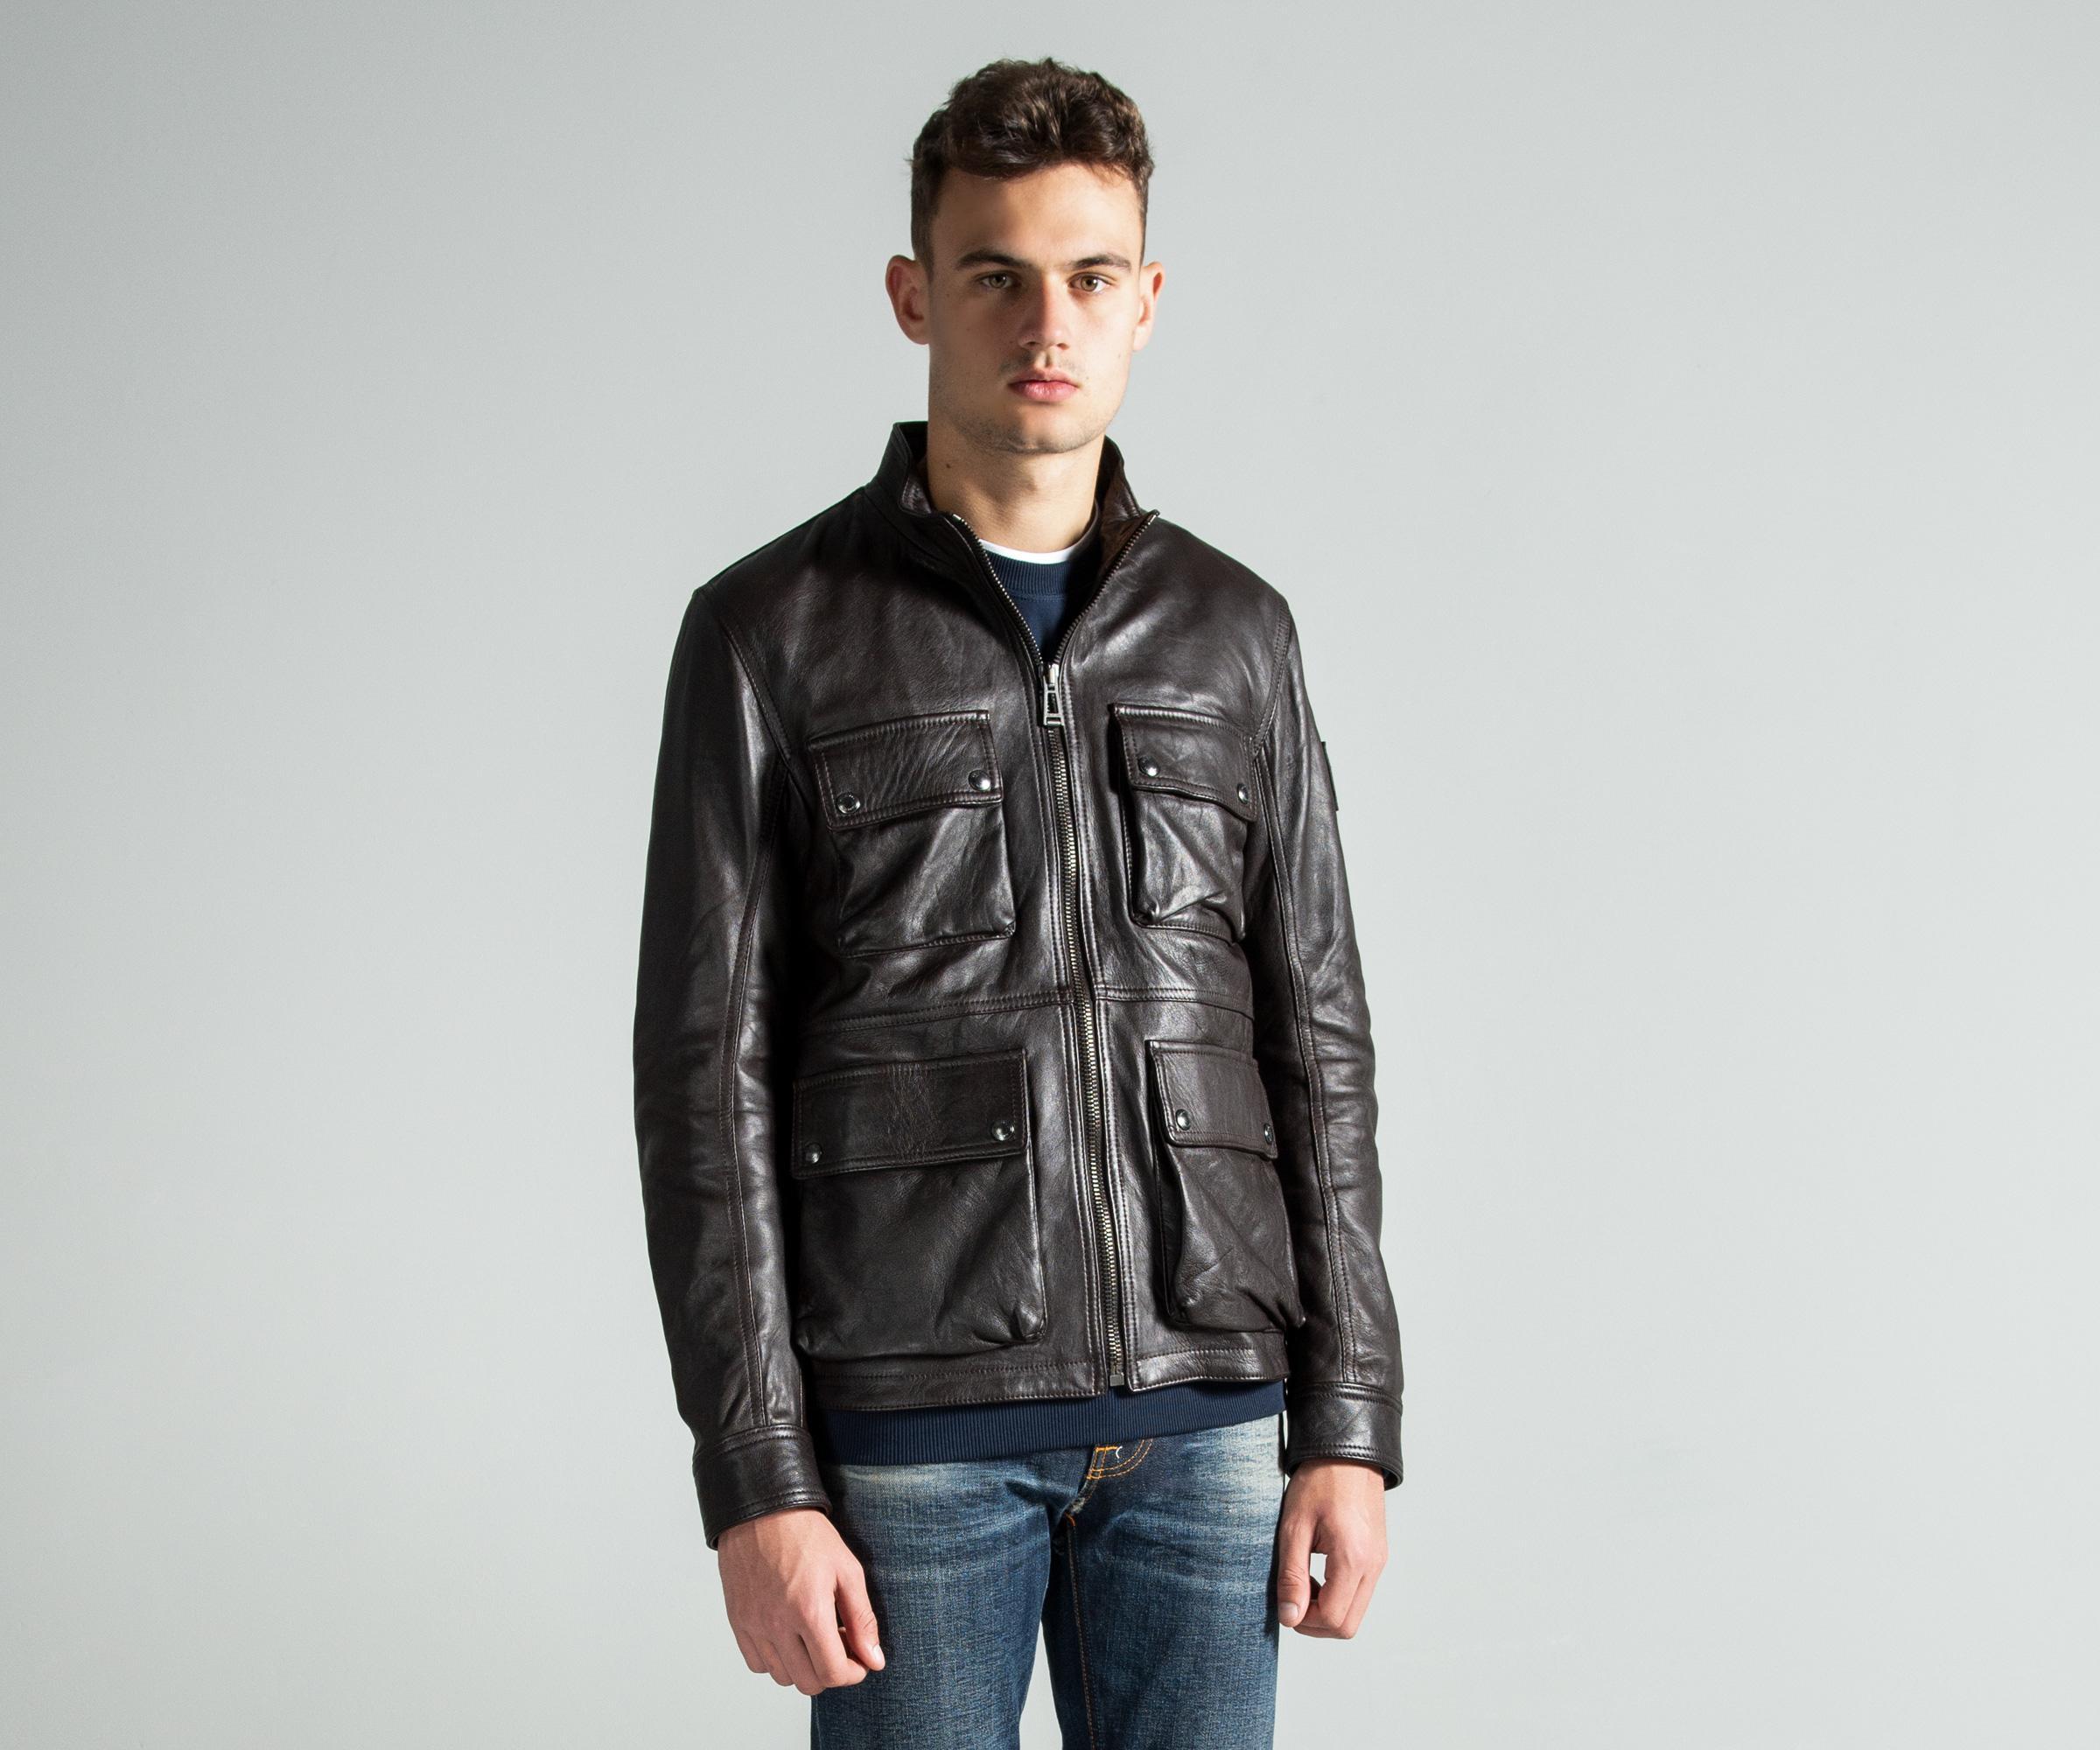 13f7d7609375 Belstaff -  new Brad  Leather Jacket Brown for Men - Lyst. View fullscreen